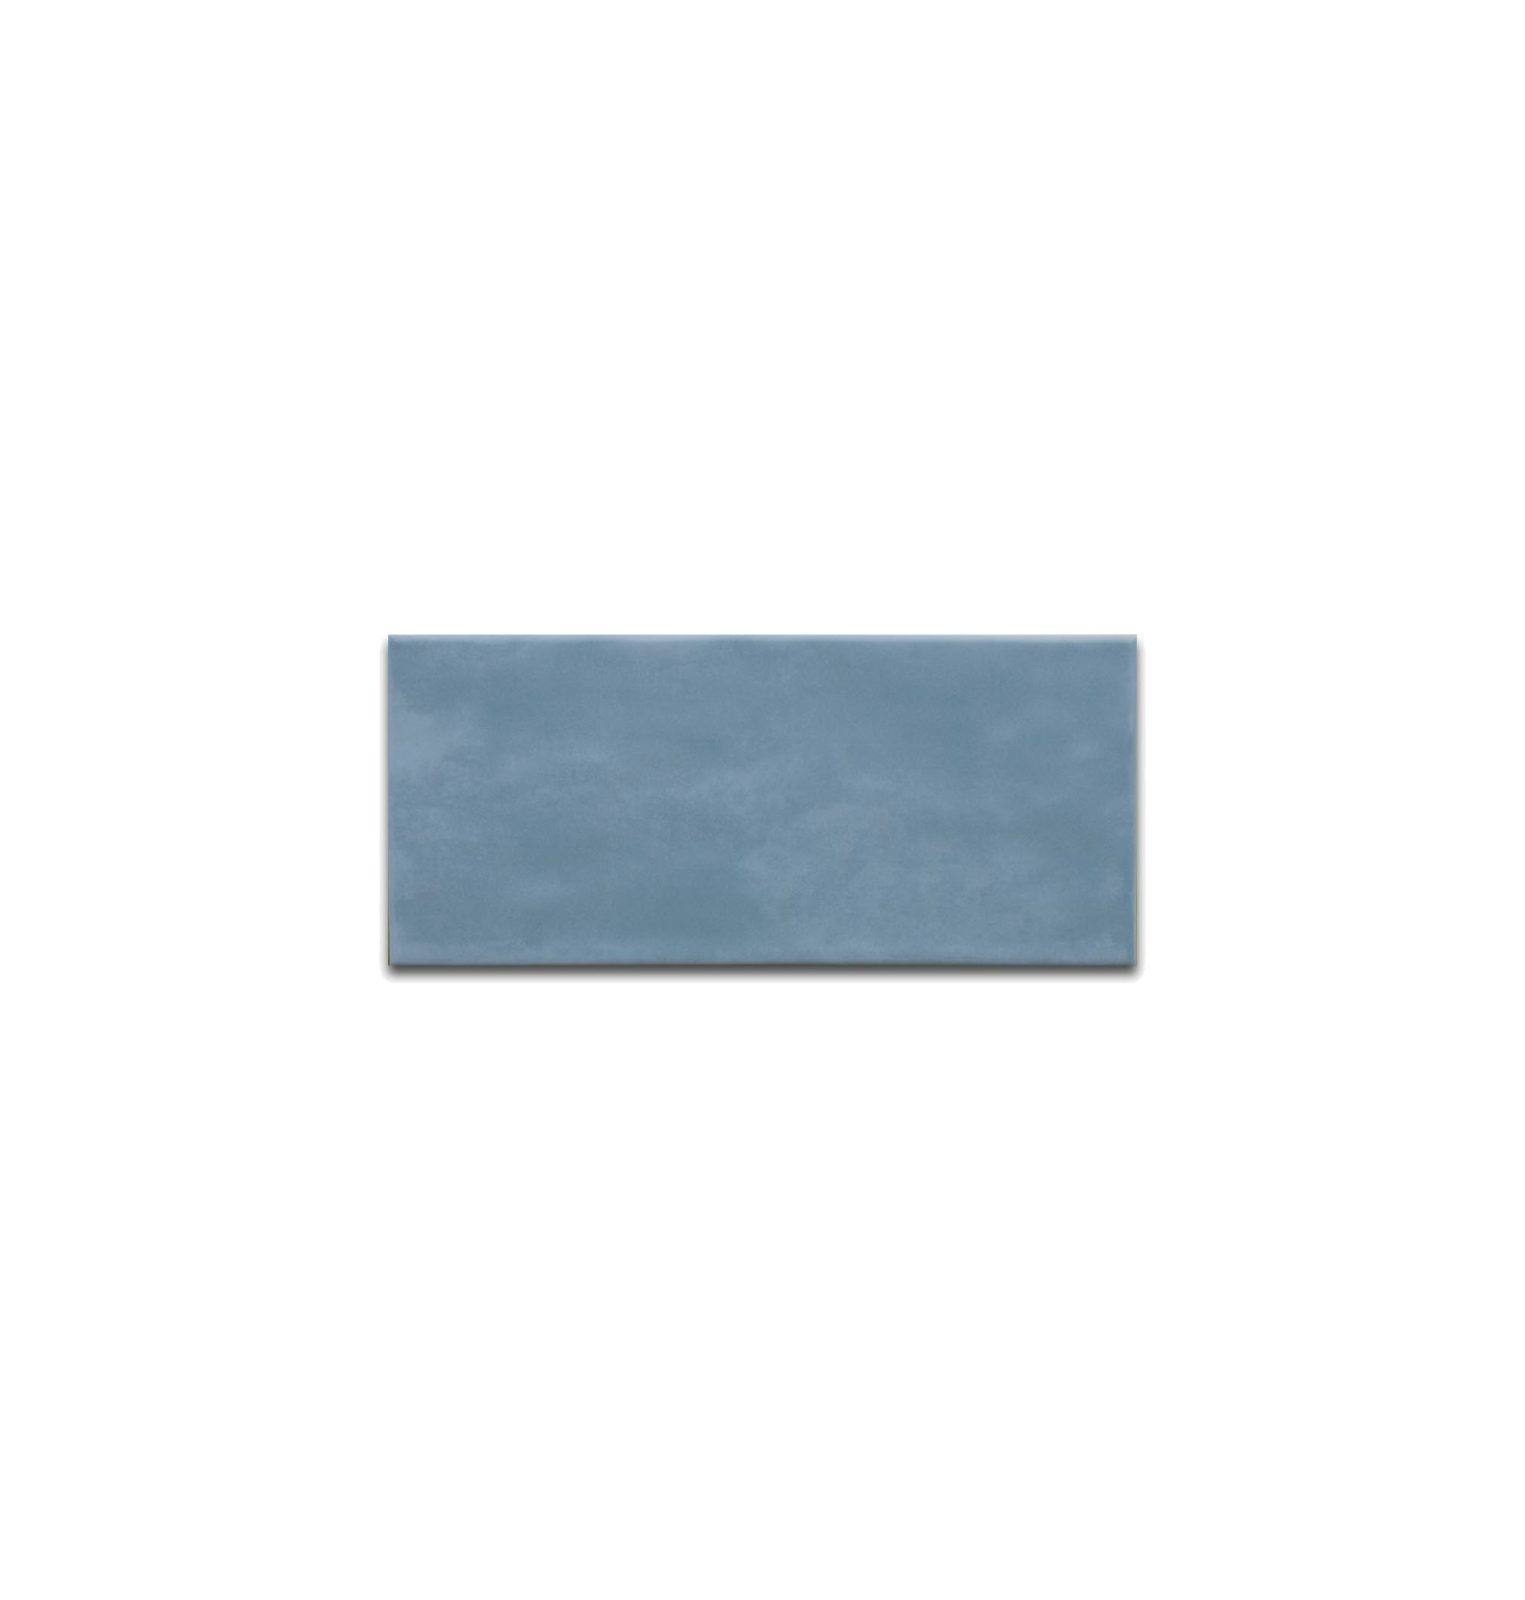 Roca Maiolica Aqua Ceramic Wall Tile 4\